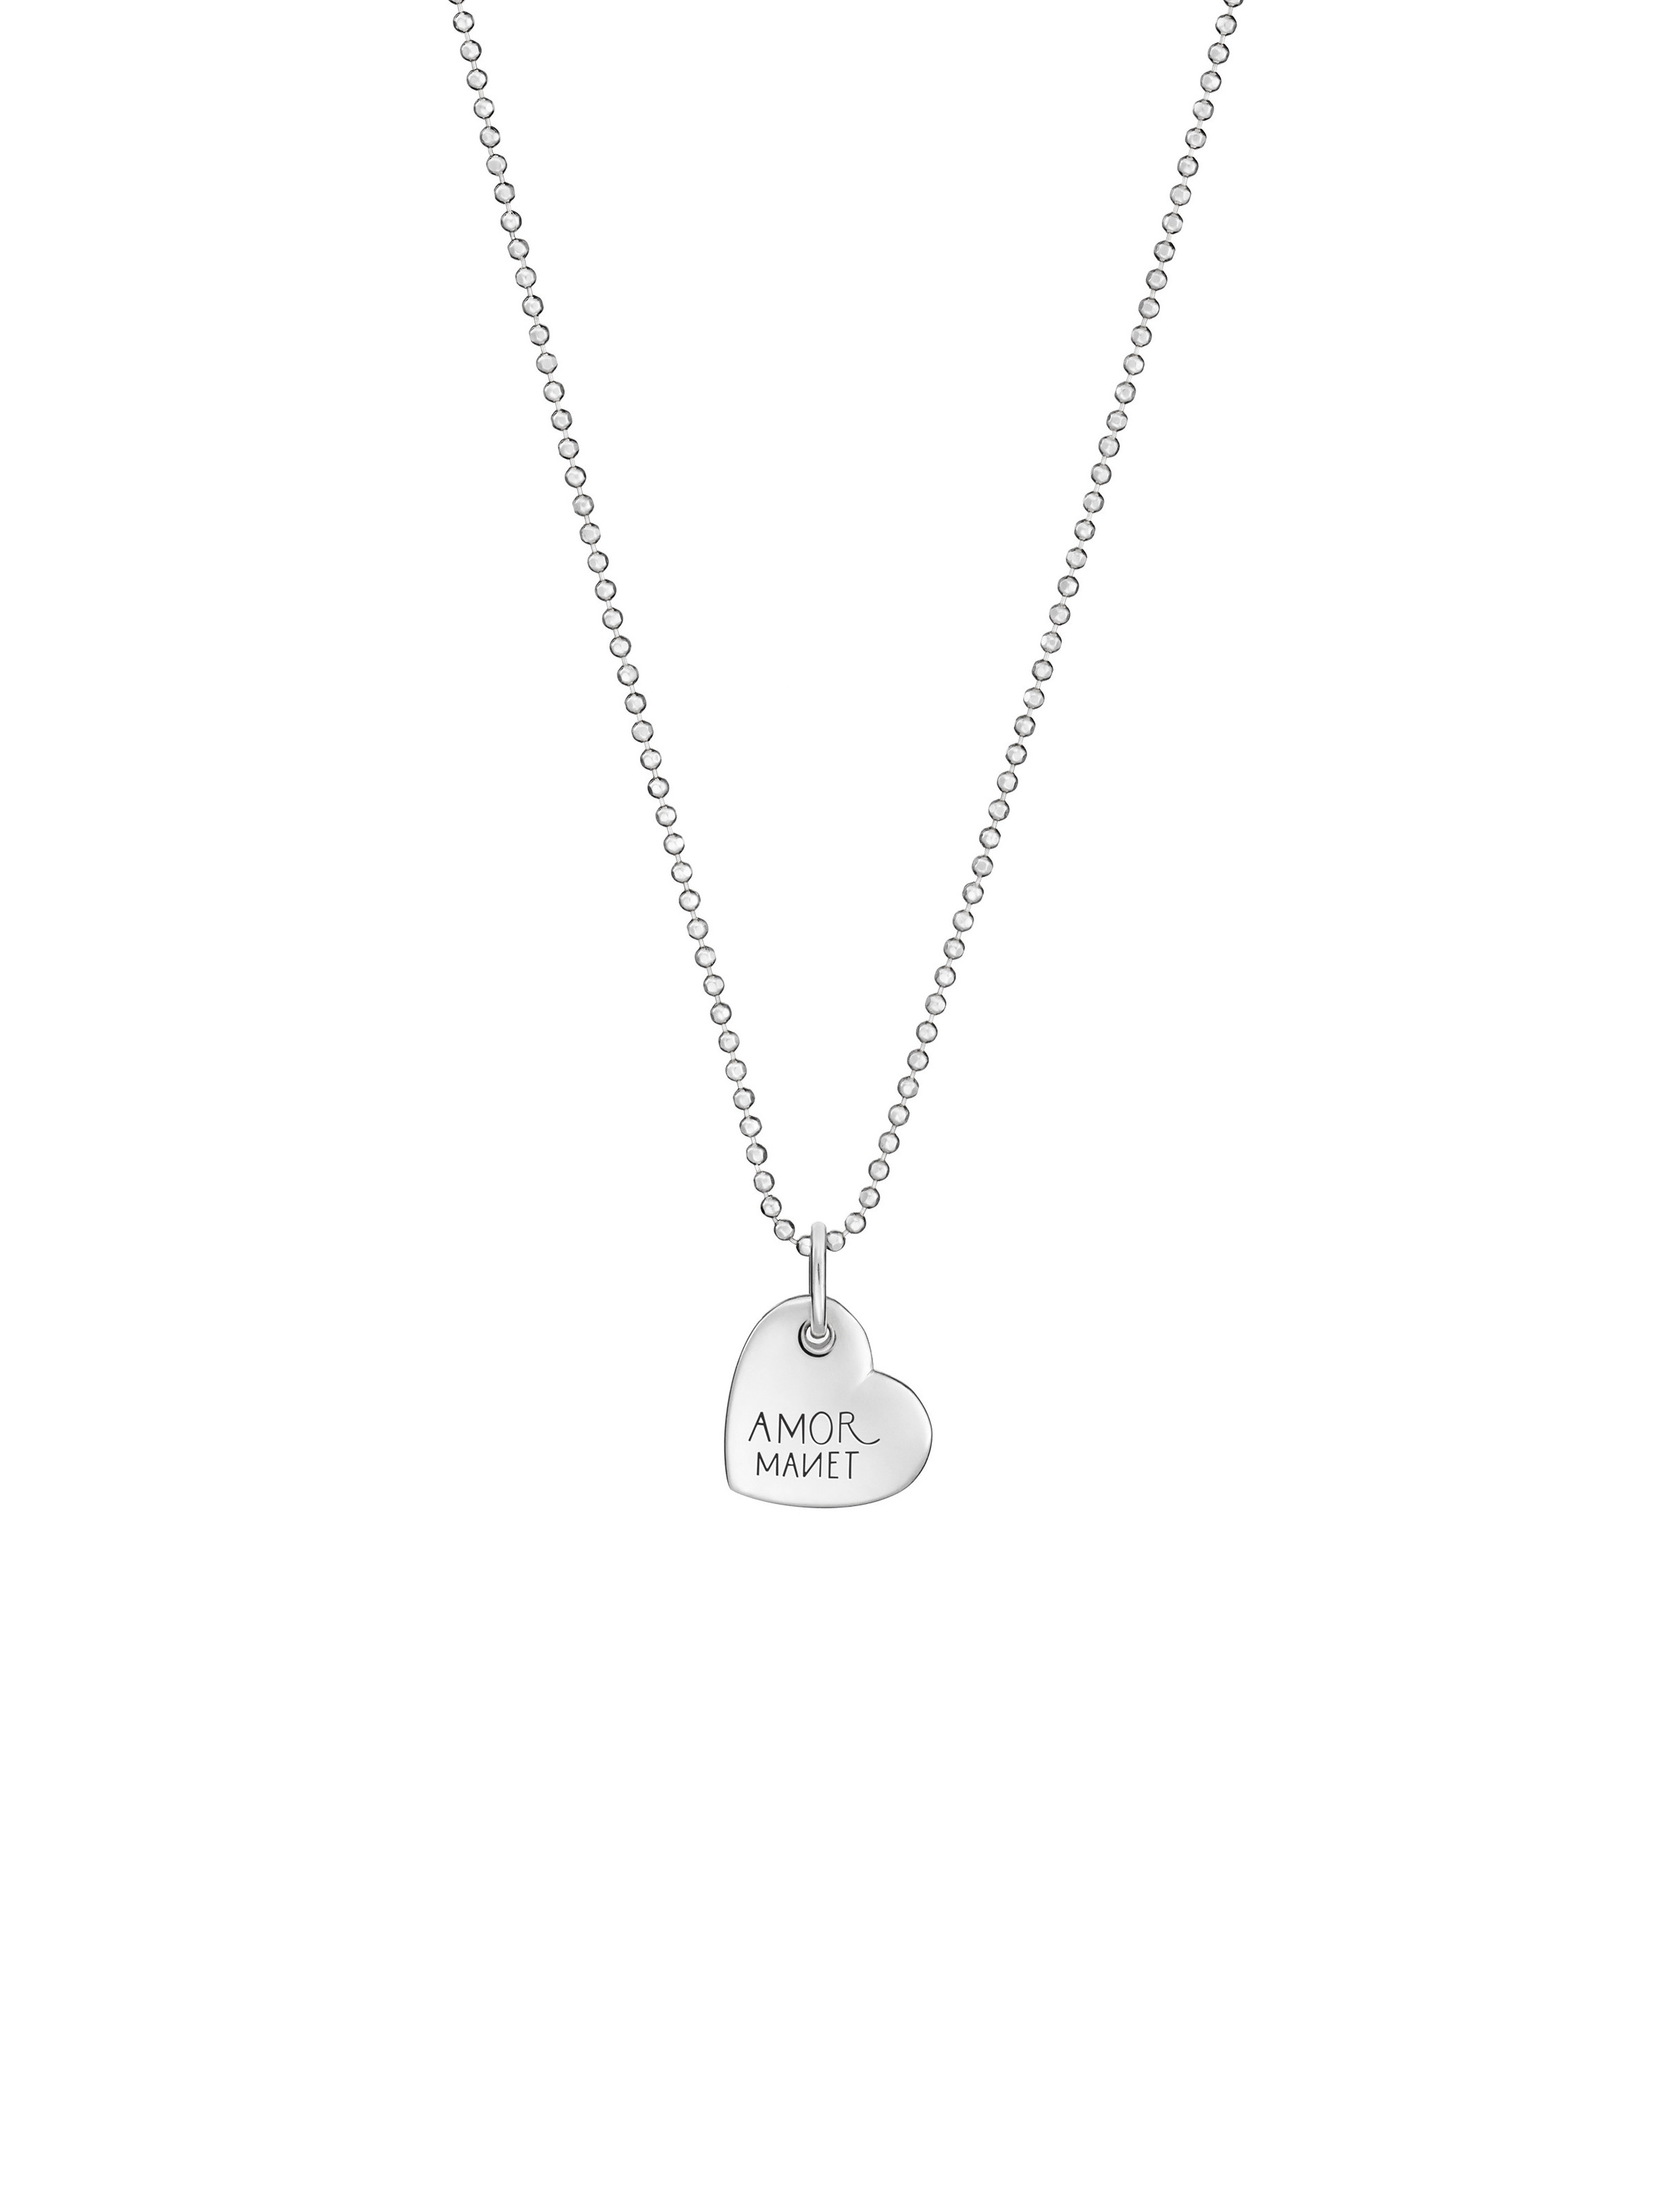 Amor Manet® pendant